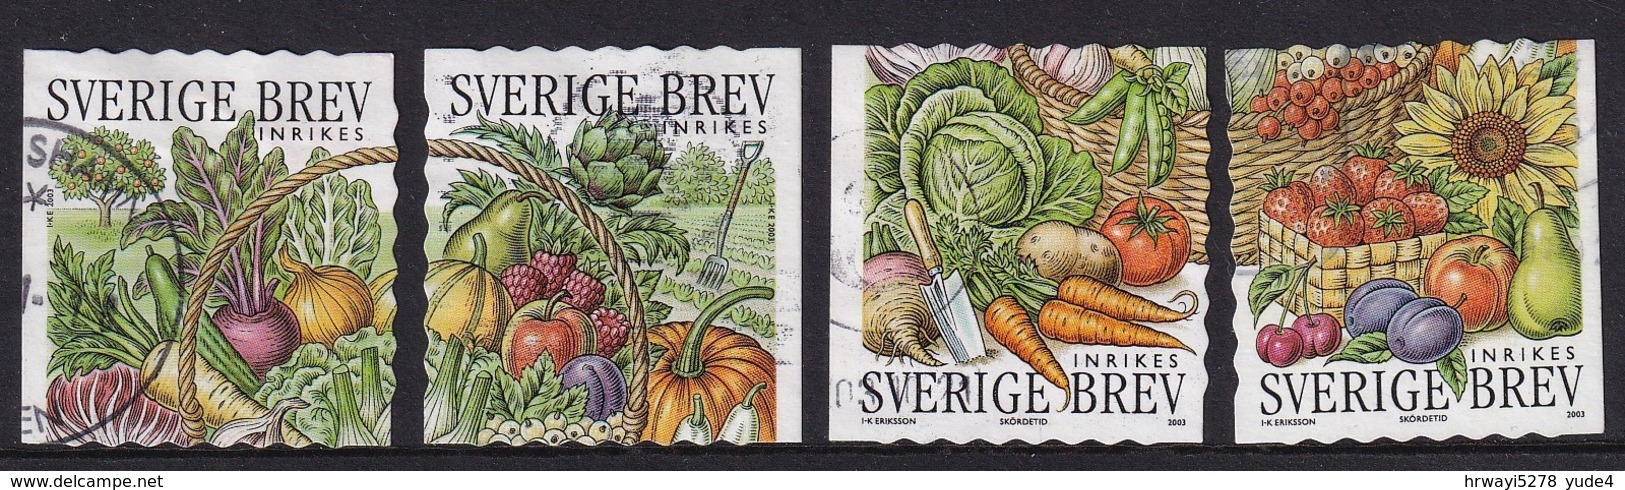 Sweden 2003, Vegetables, Complete Set Vfu. Cv 4,80 Euro - Oblitérés